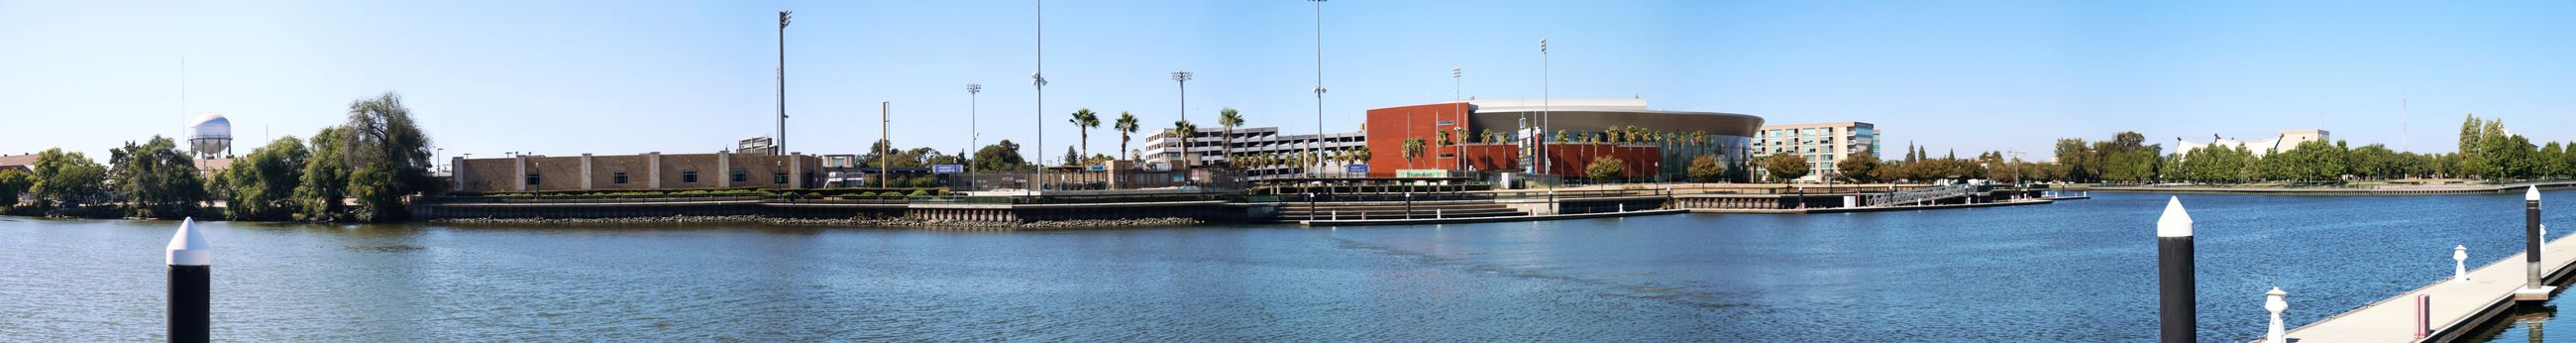 Panorama Downtown Stockton